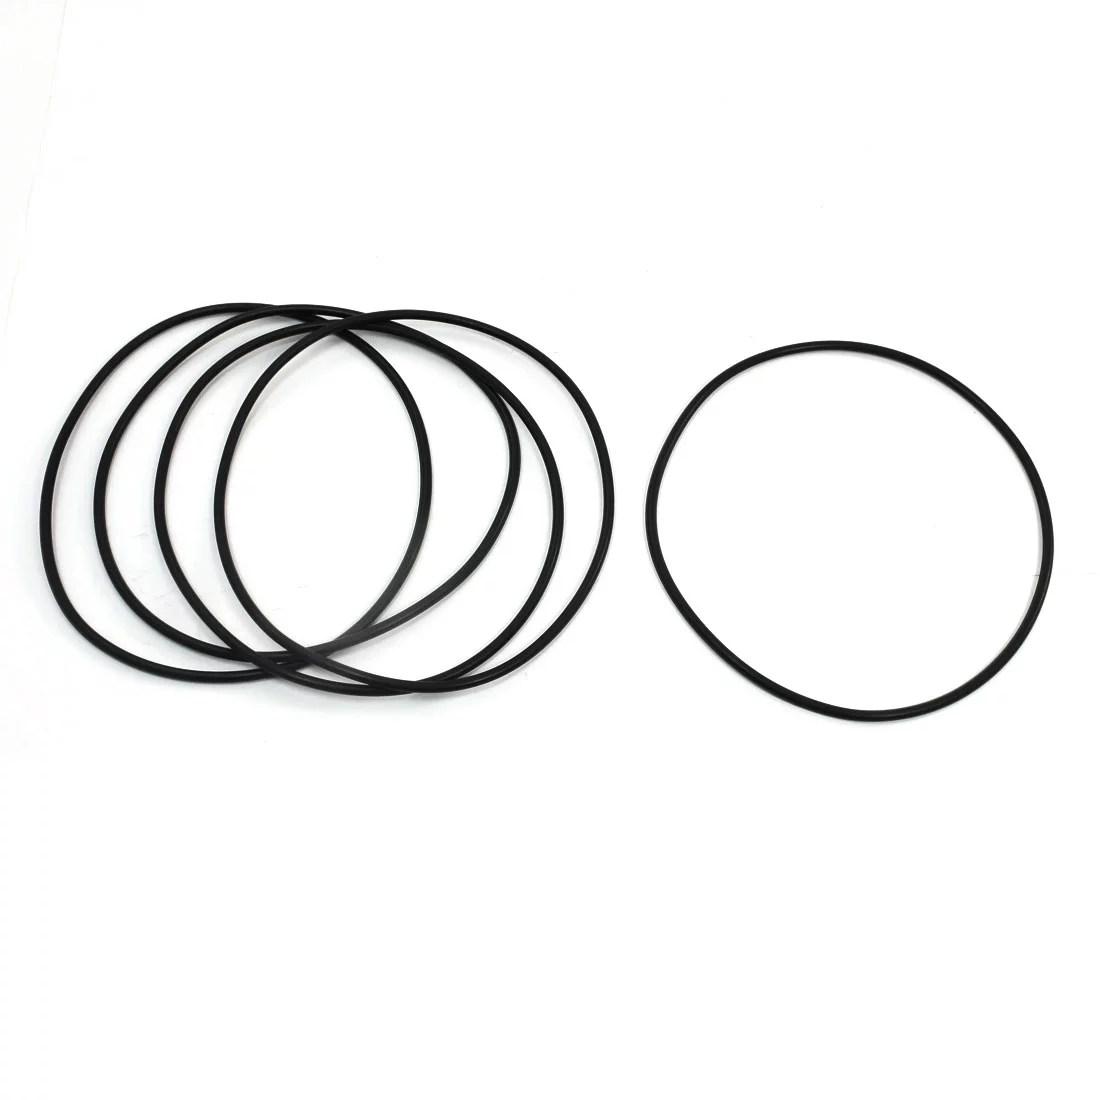 120mm X 3 1mm Sealing Oil Liquid Filter Pu O Rings Gaskets 5pcs